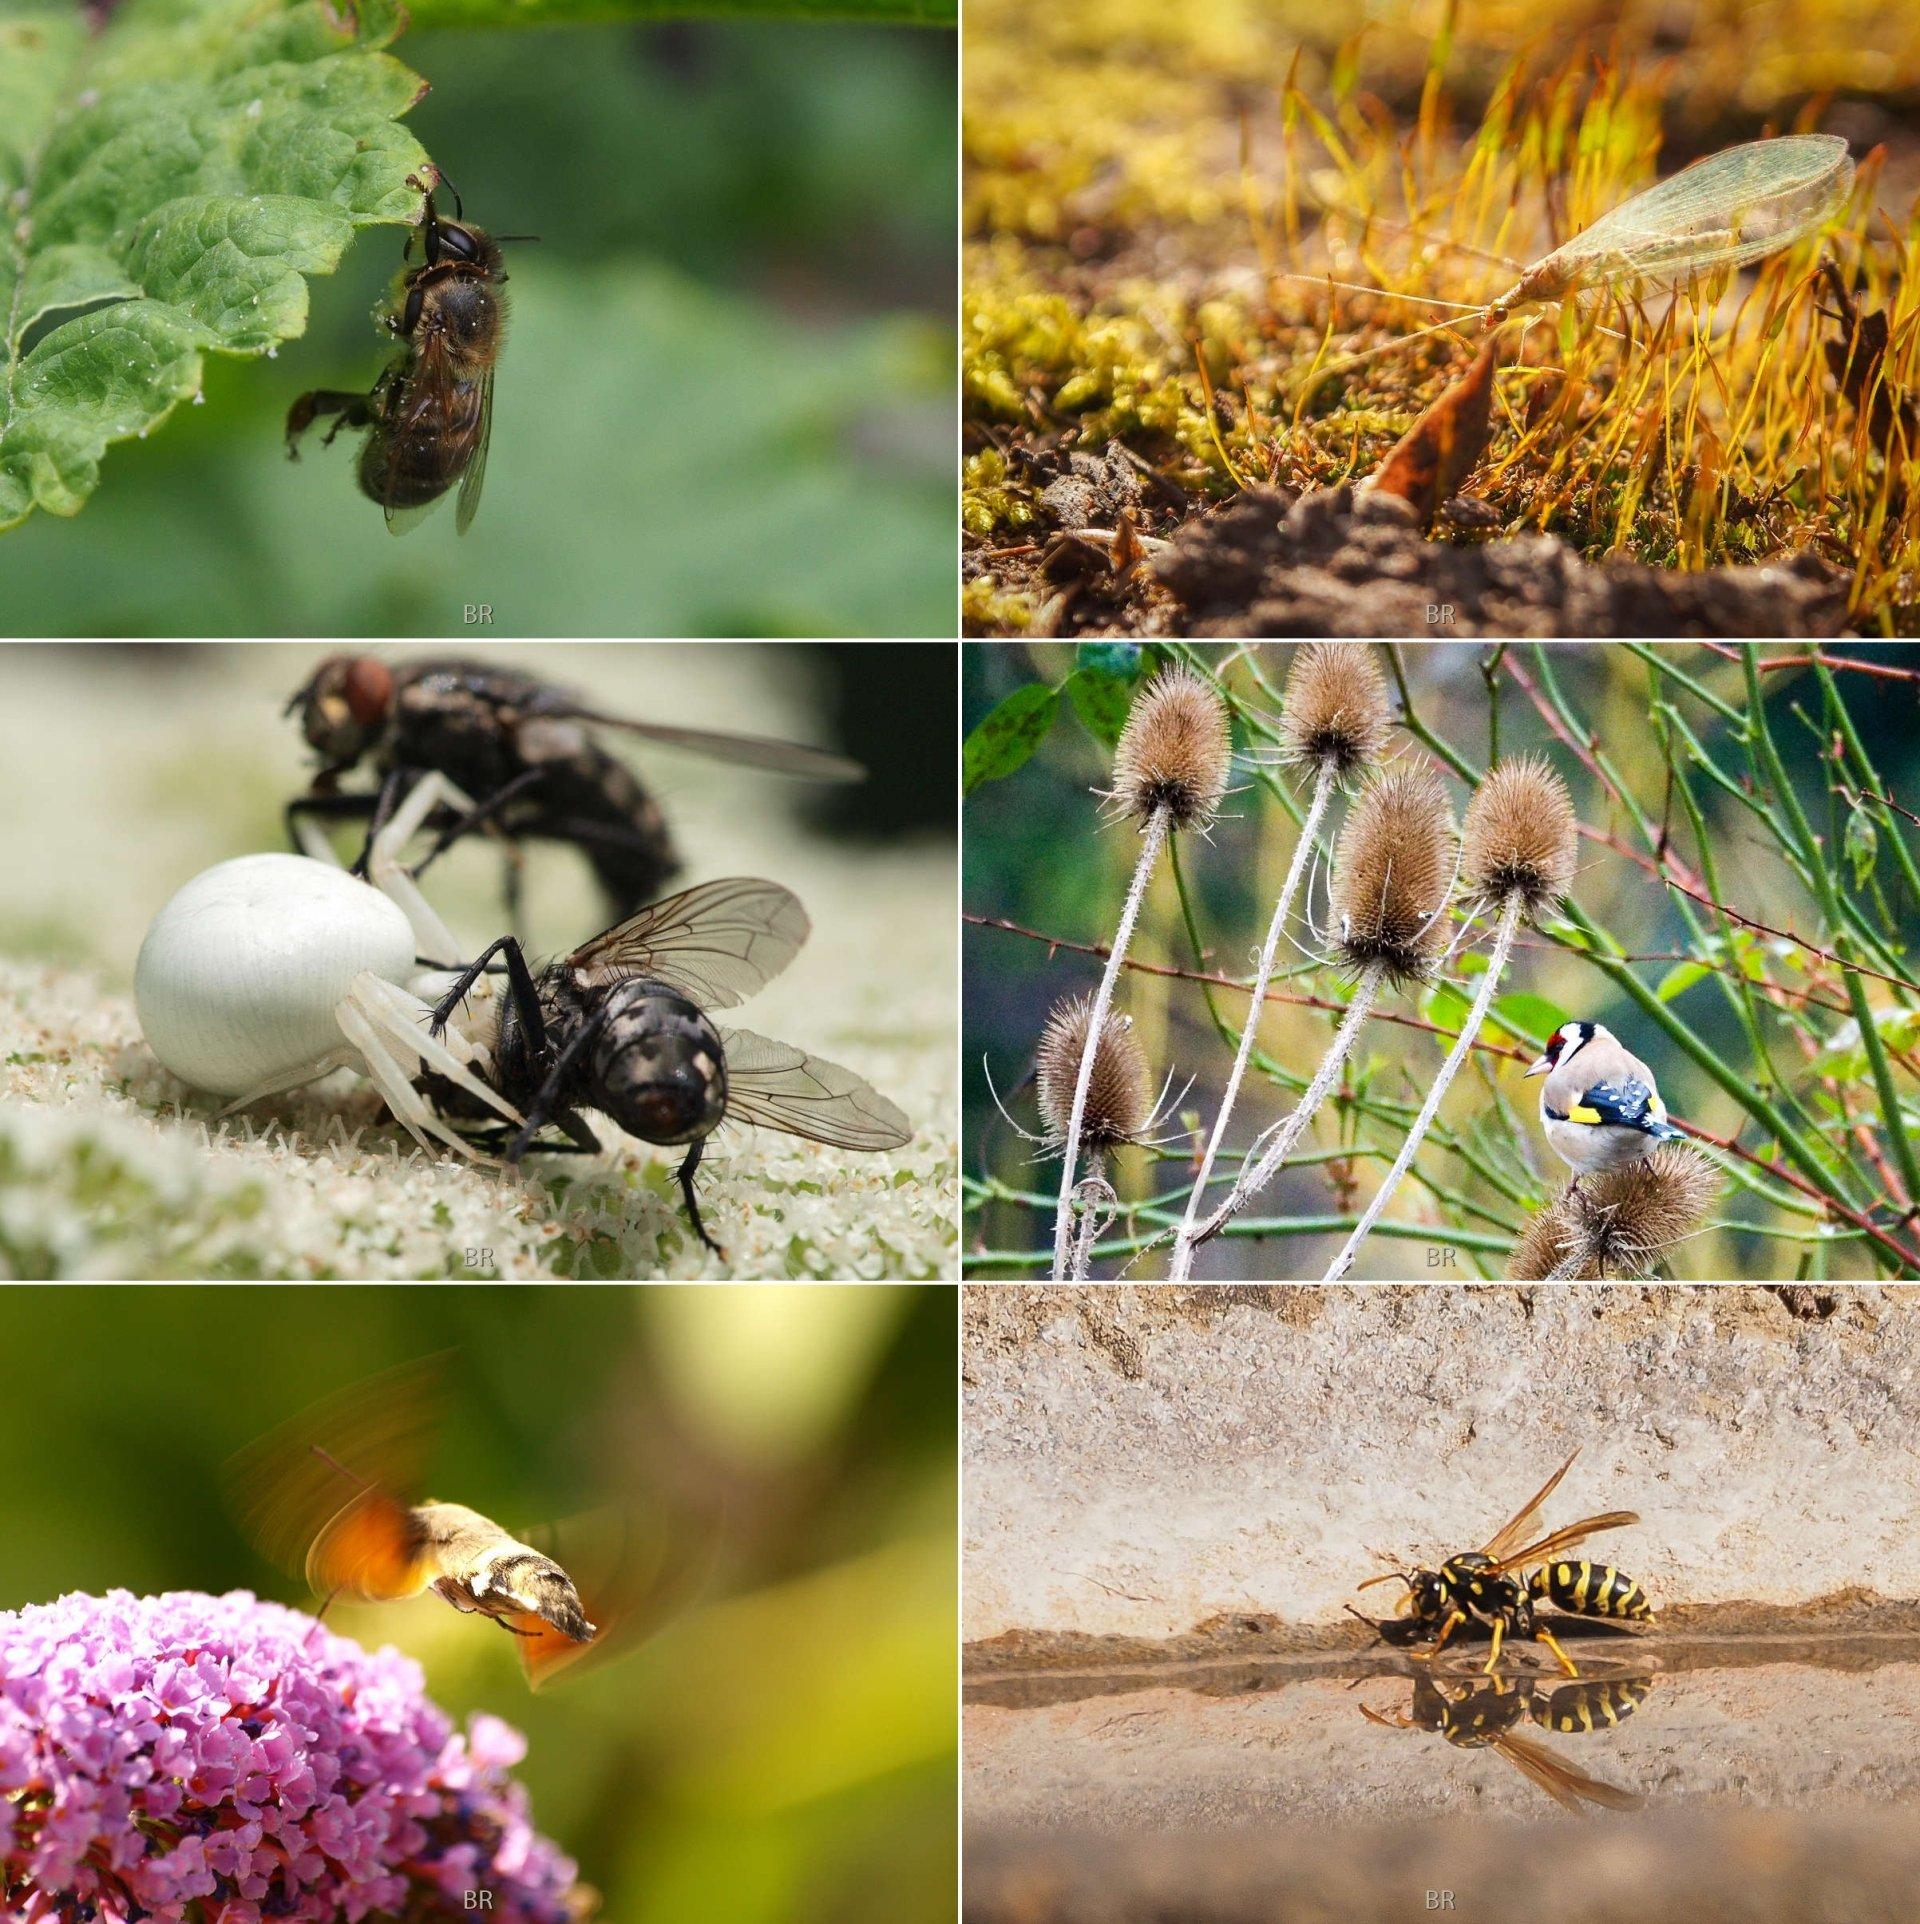 Tiere im Naturgarten